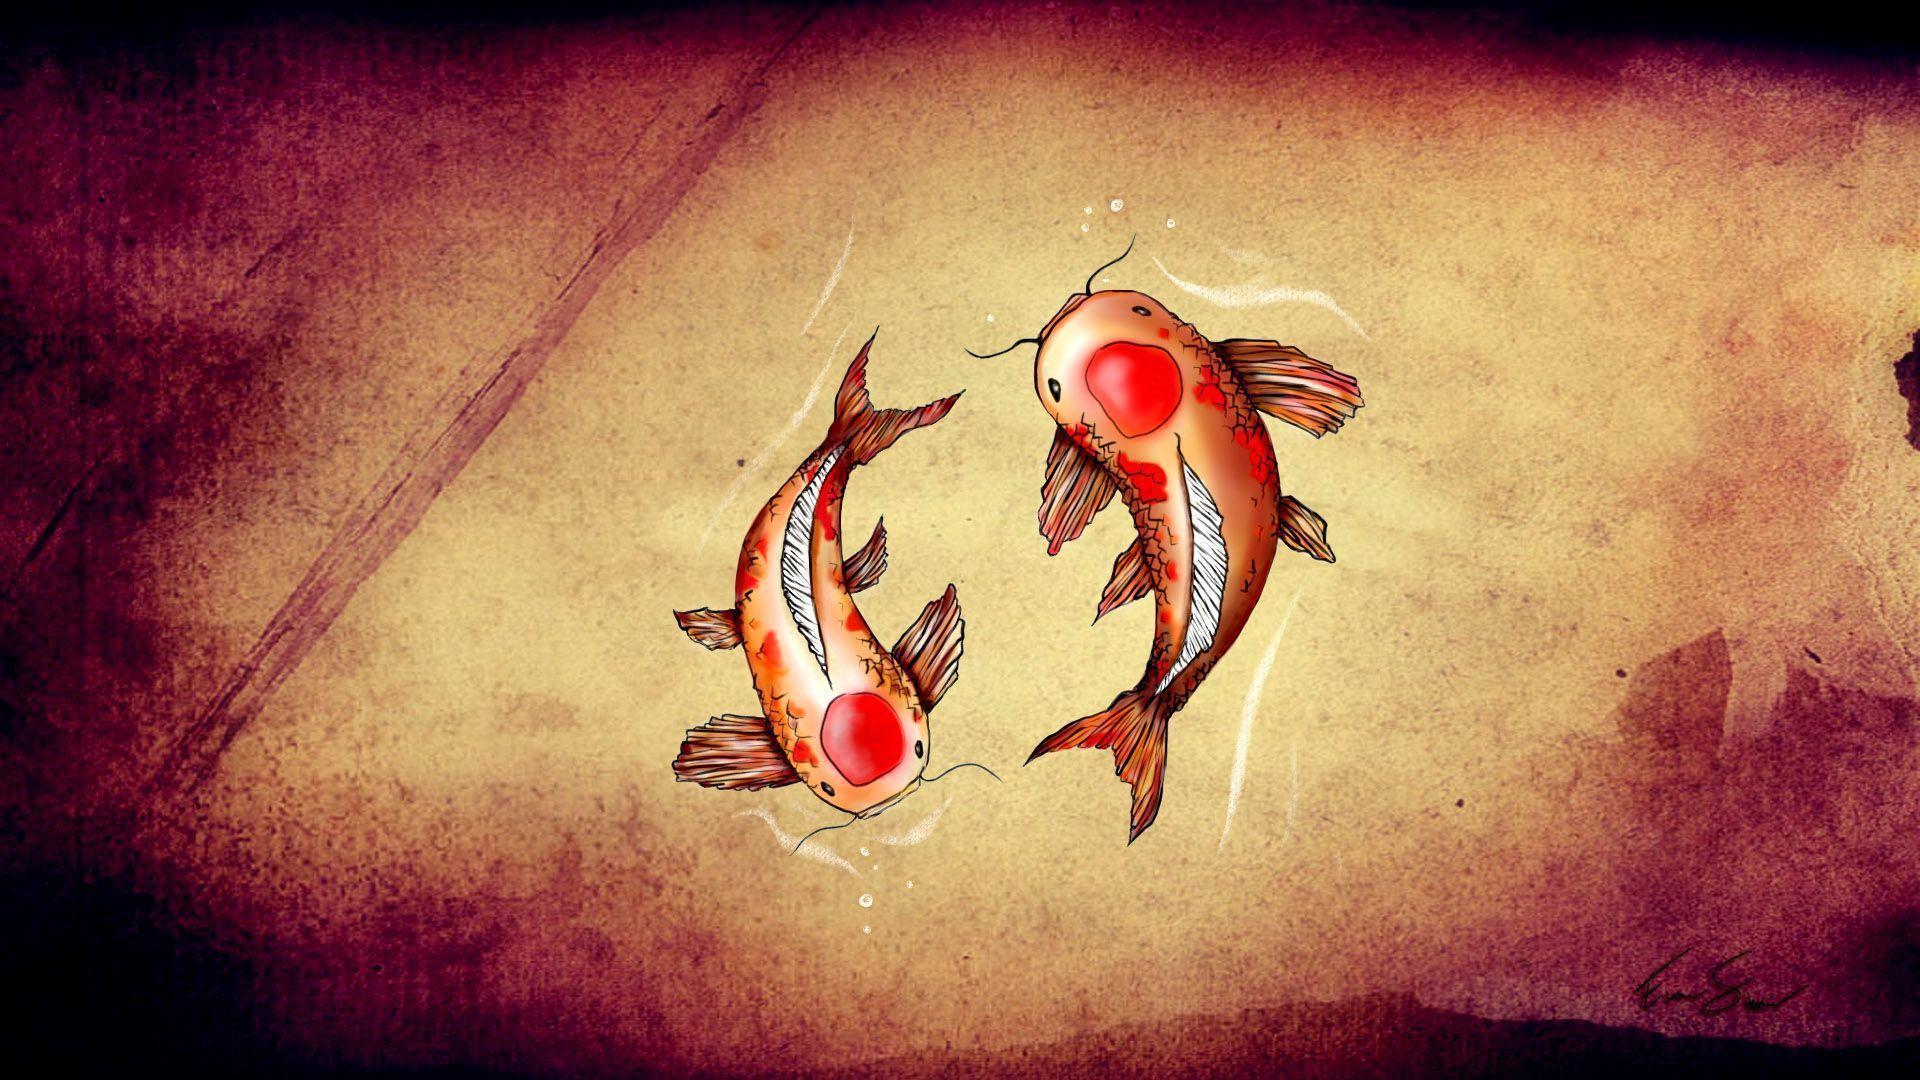 Anime Koi Fish Girl Wallpaper Coy Fish Wallpapers Wallpaper Cave